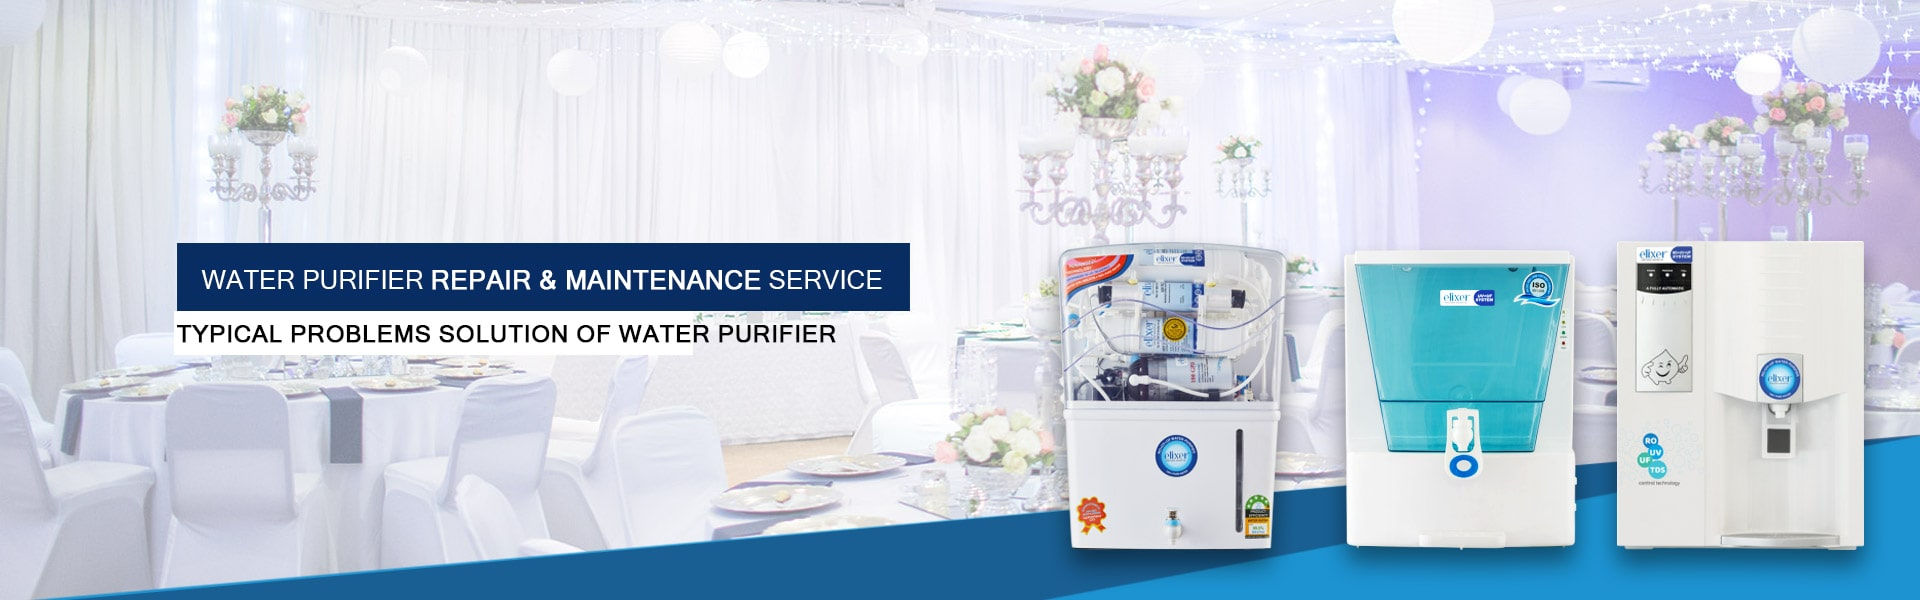 kent ro water purifier repair service